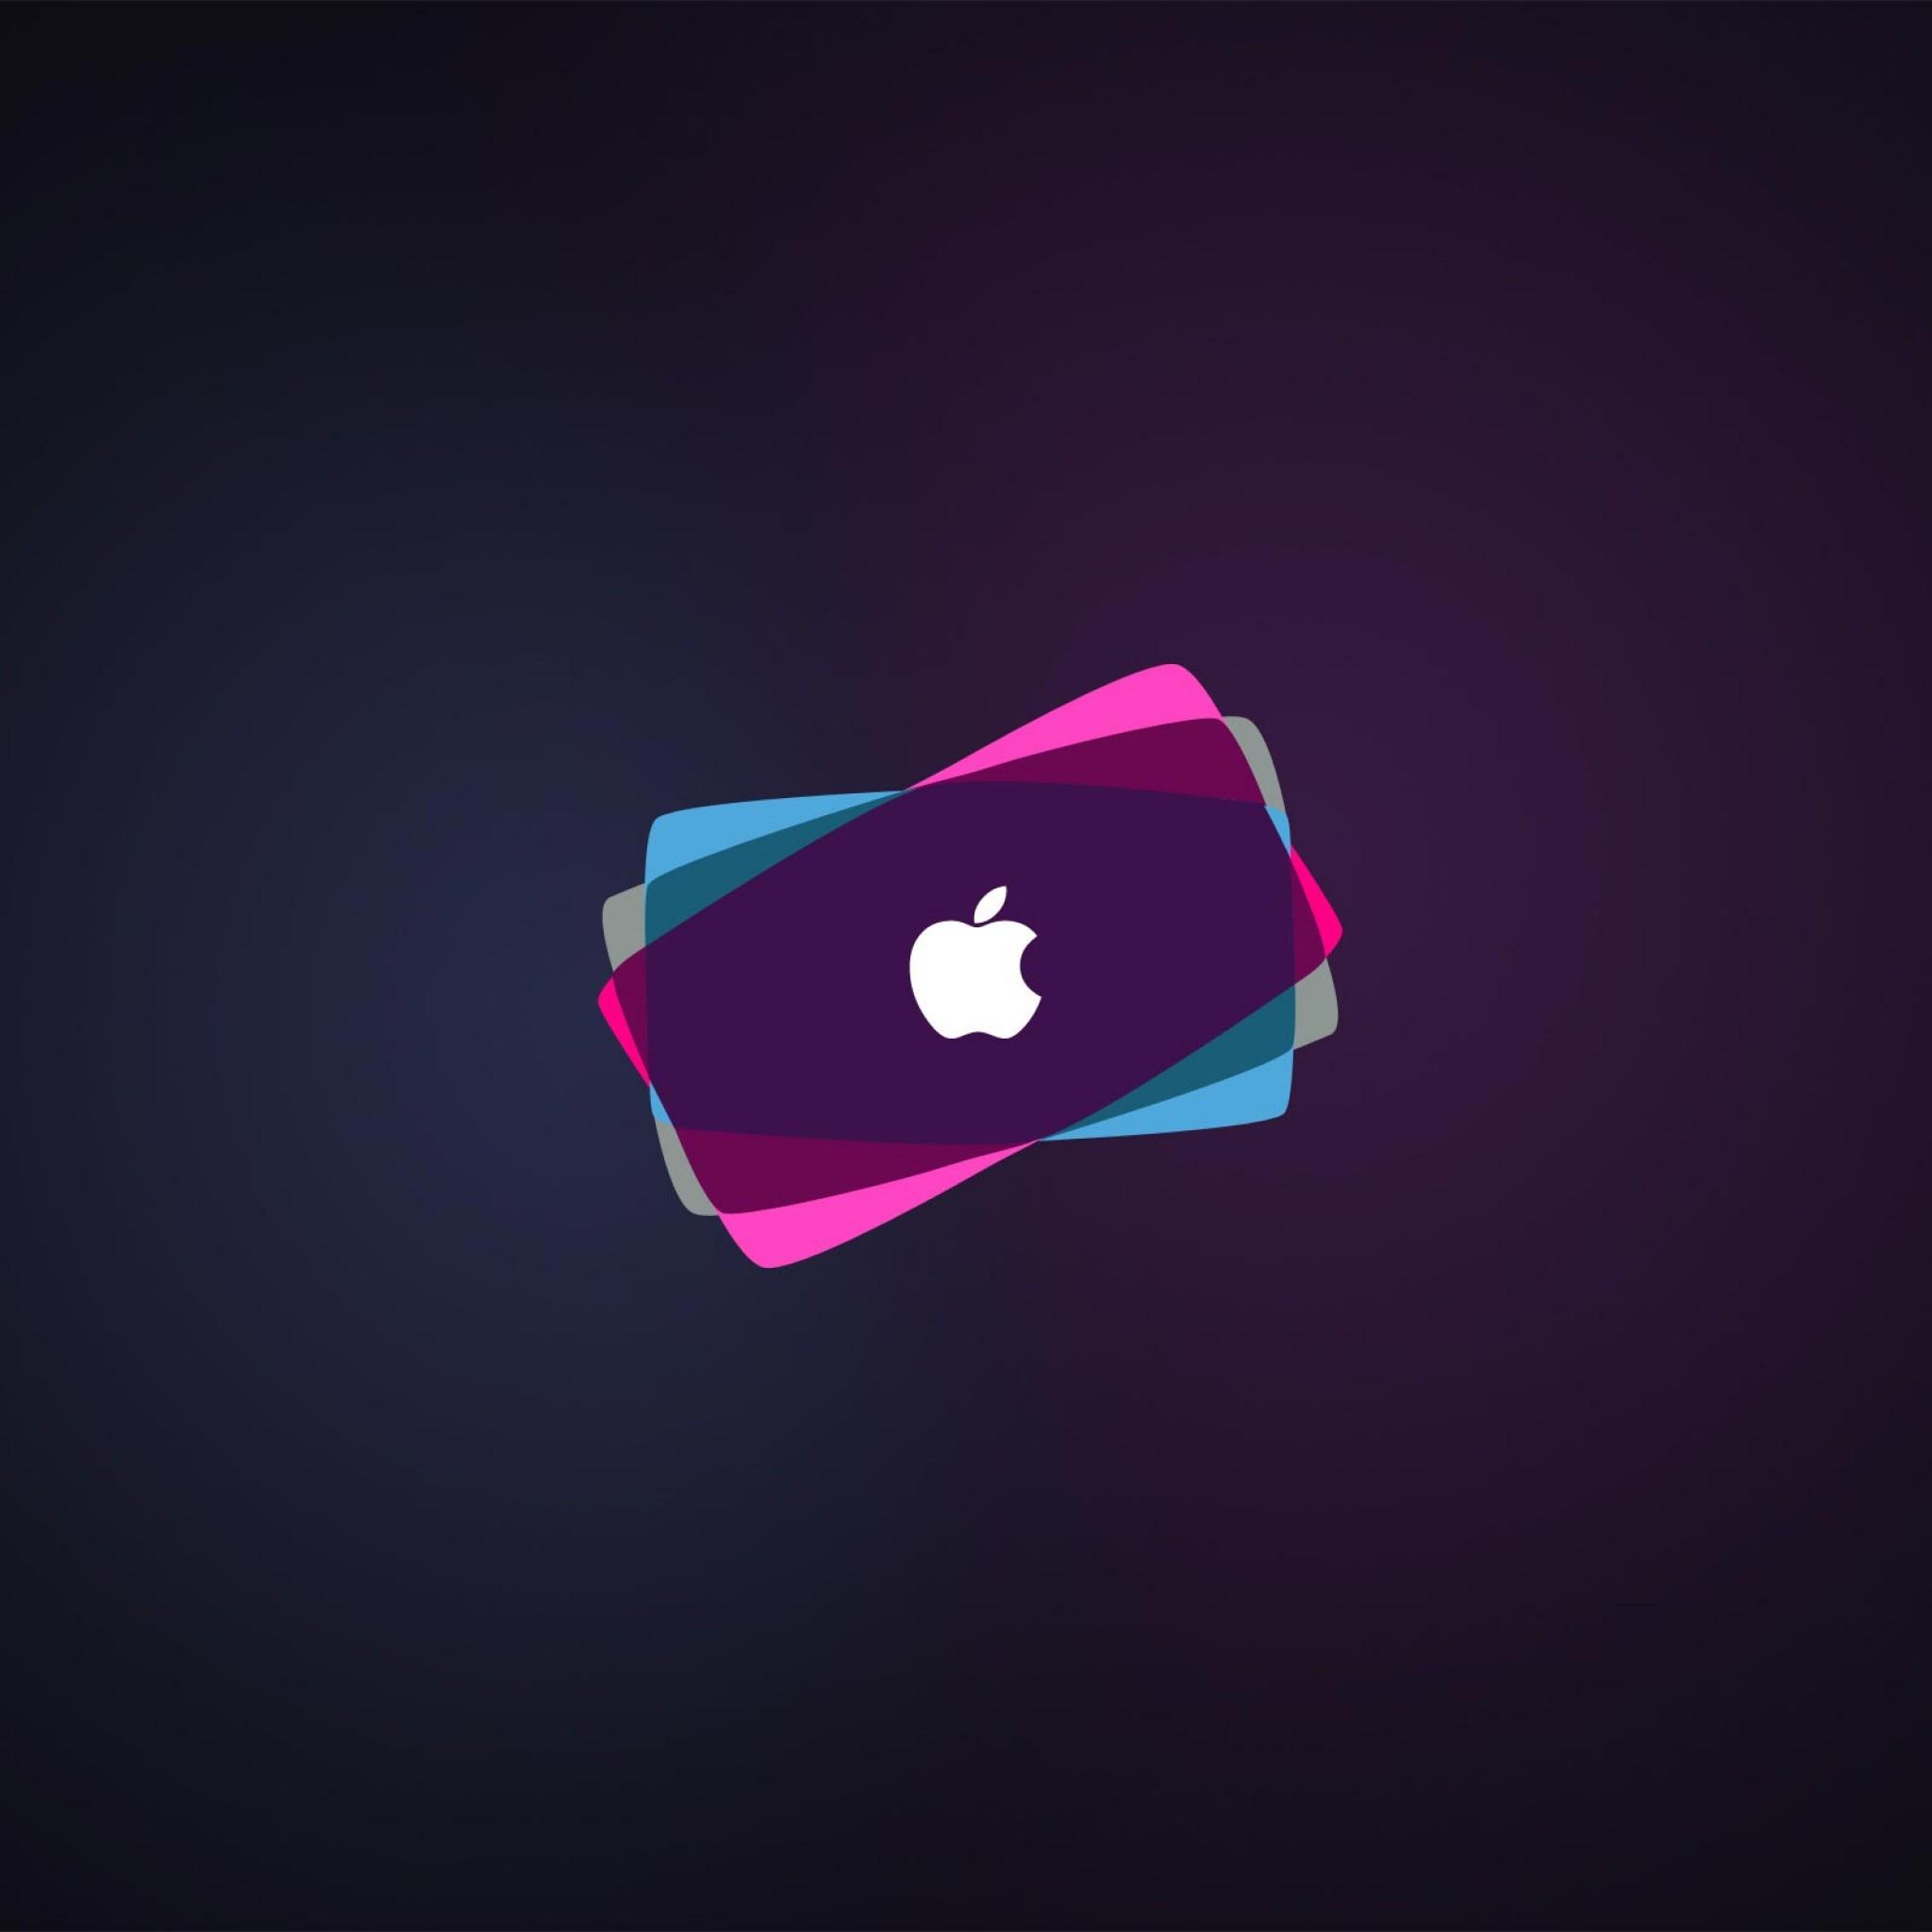 Ipad Background Hd 2048x2048